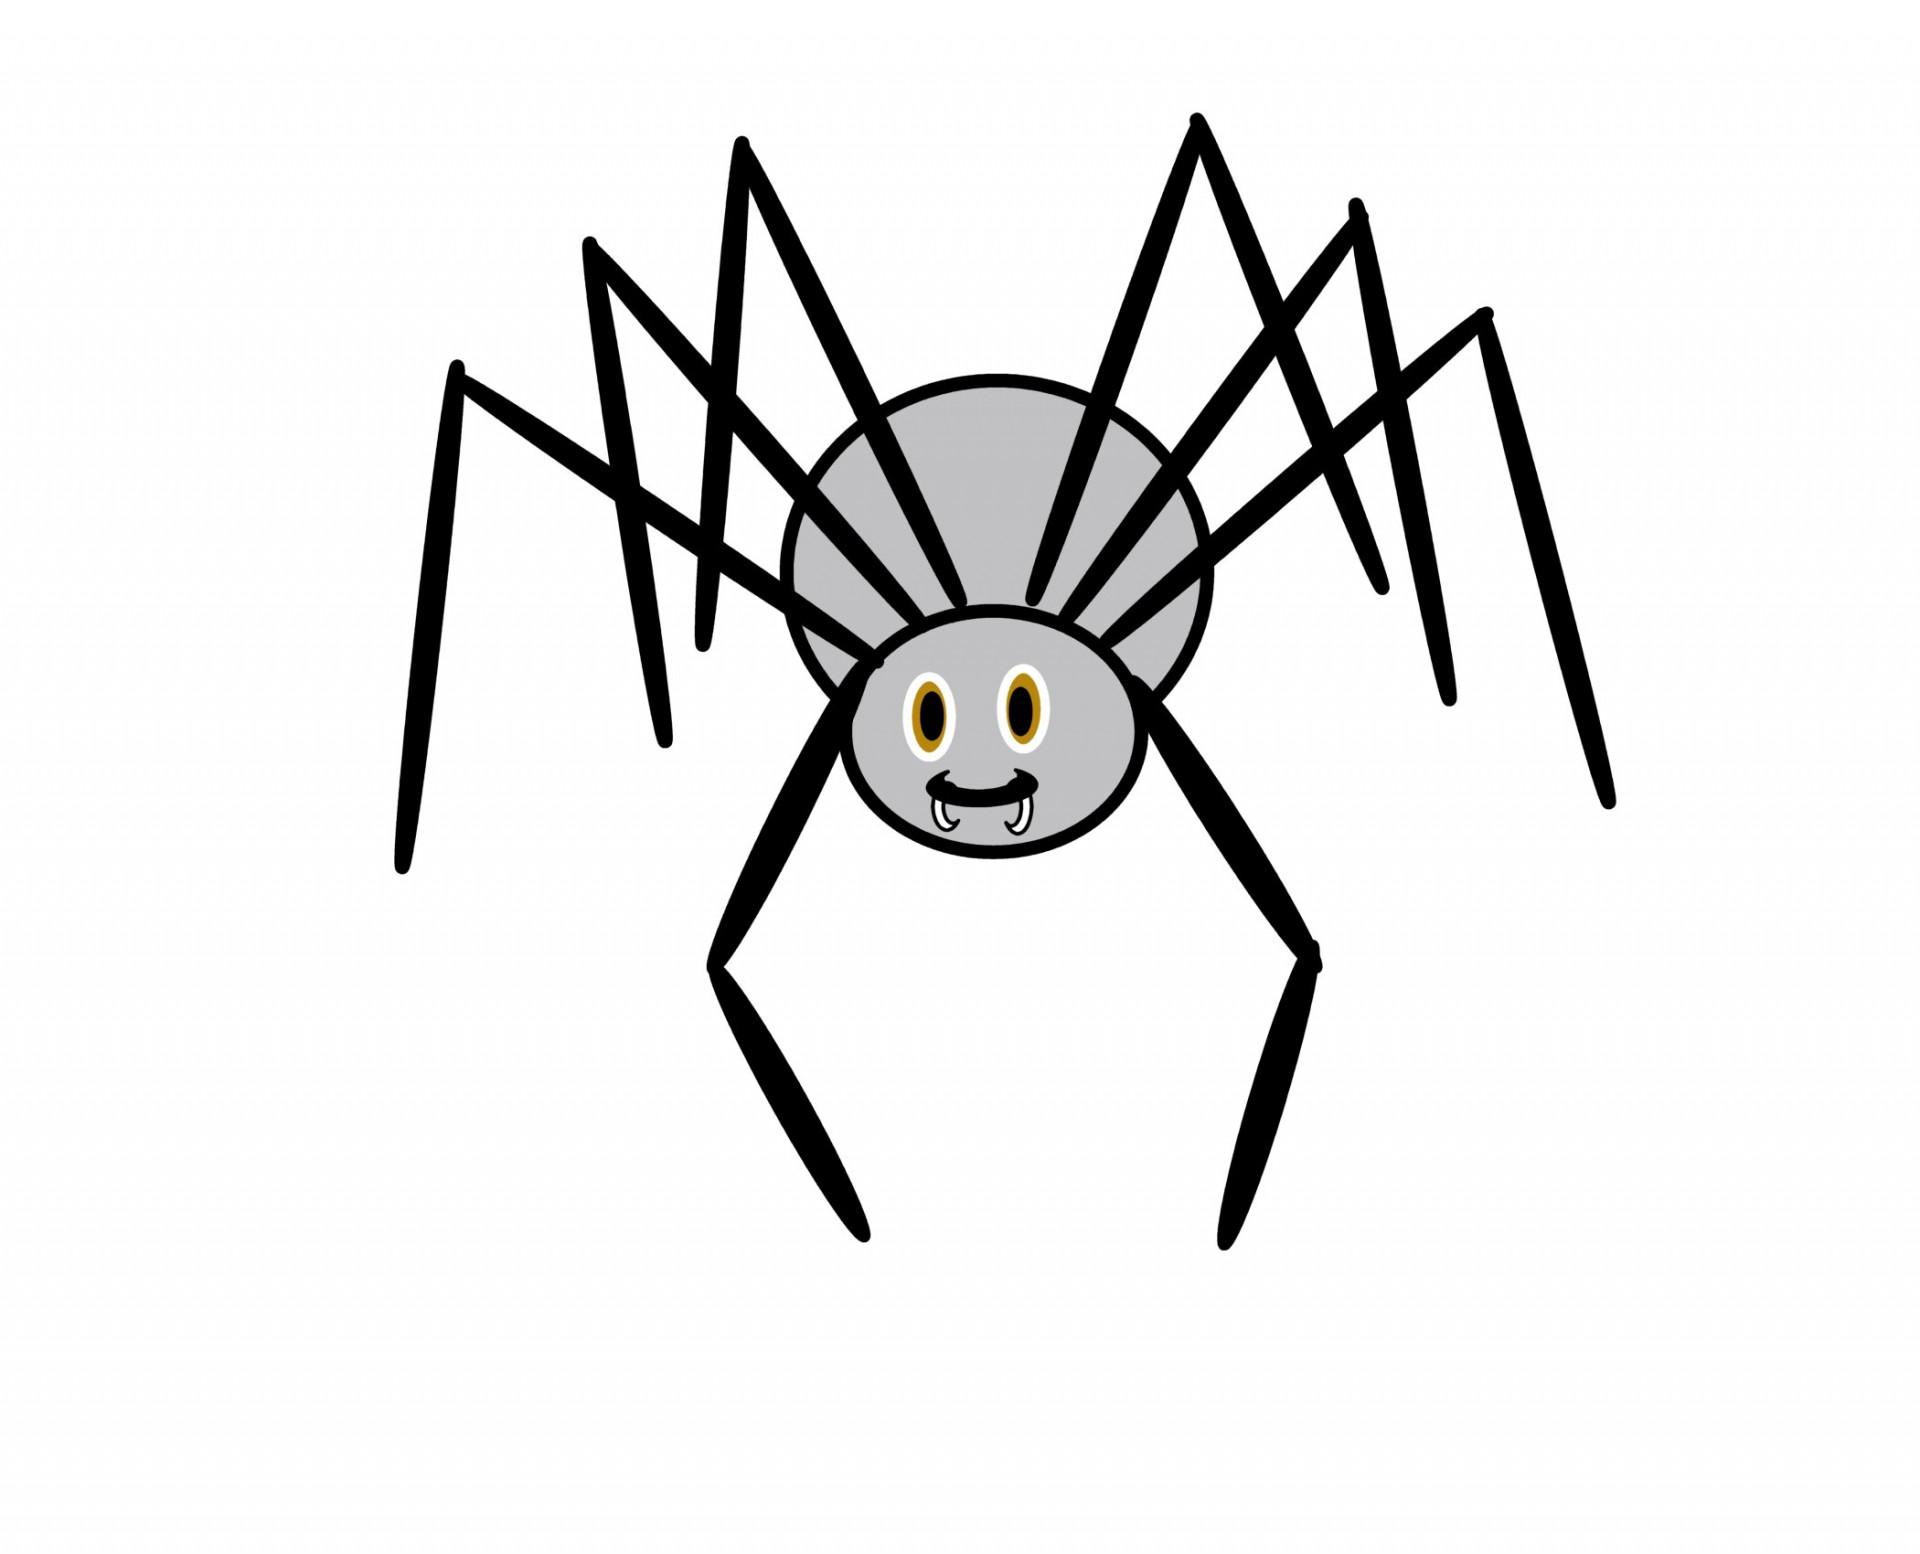 1920x1554 Clip Art Spider Free Stock Photo